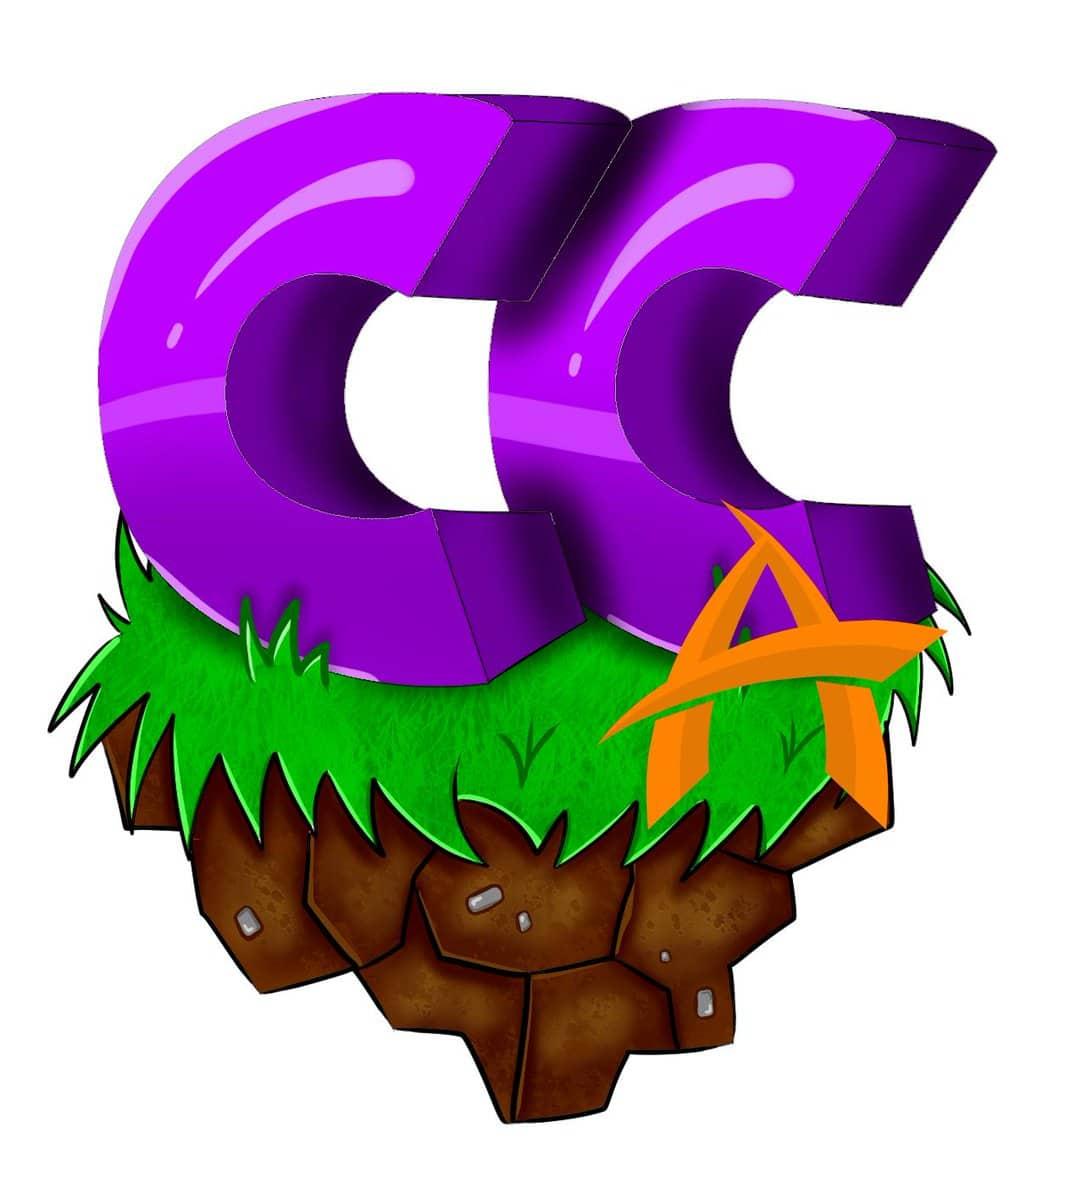 Discord logo - CC